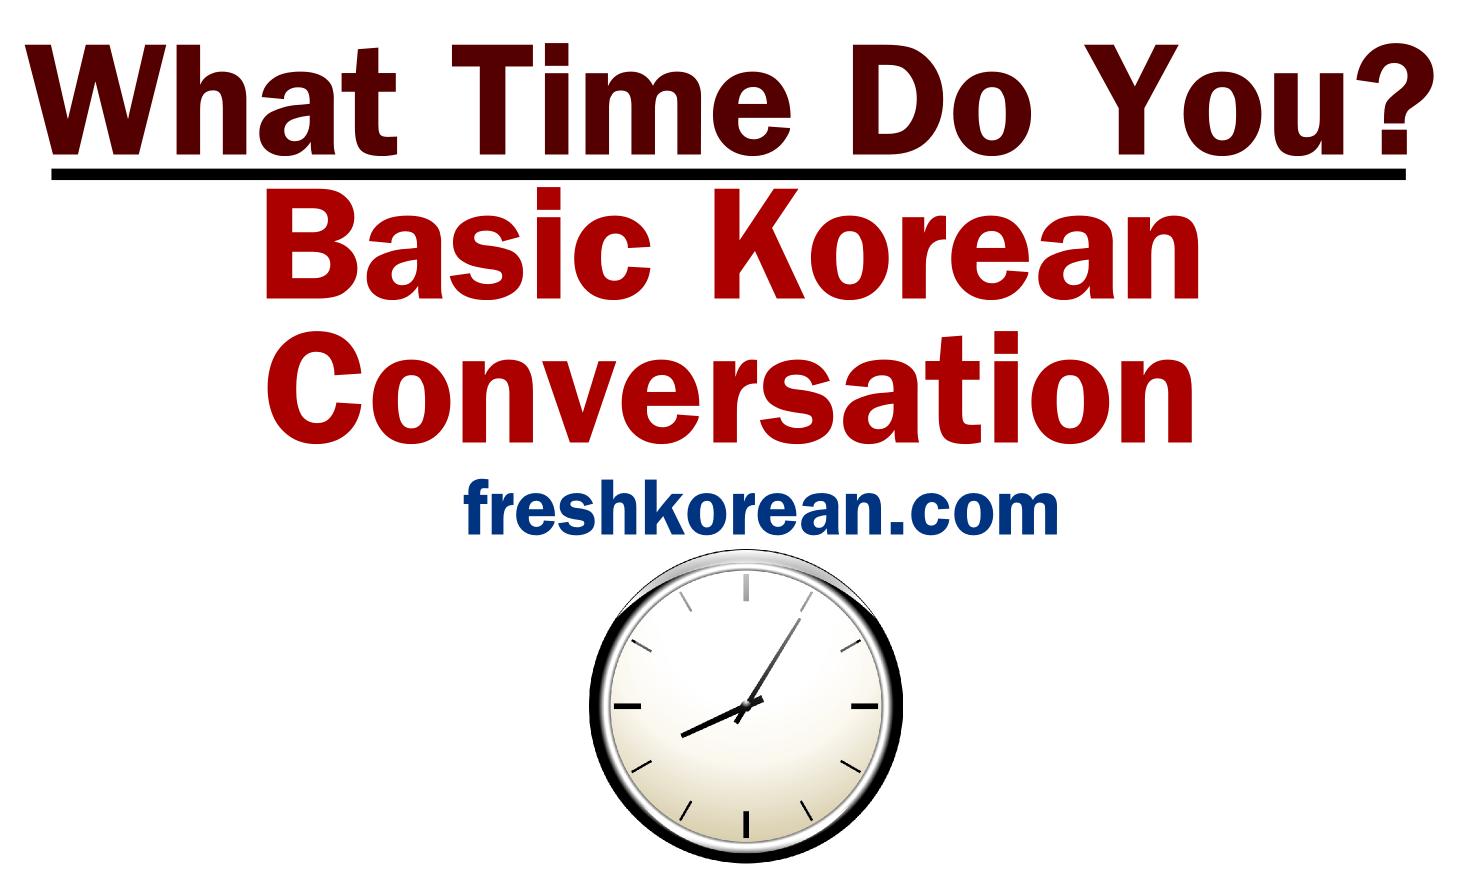 Basic Korean Conversation 12 What Time Do You Free